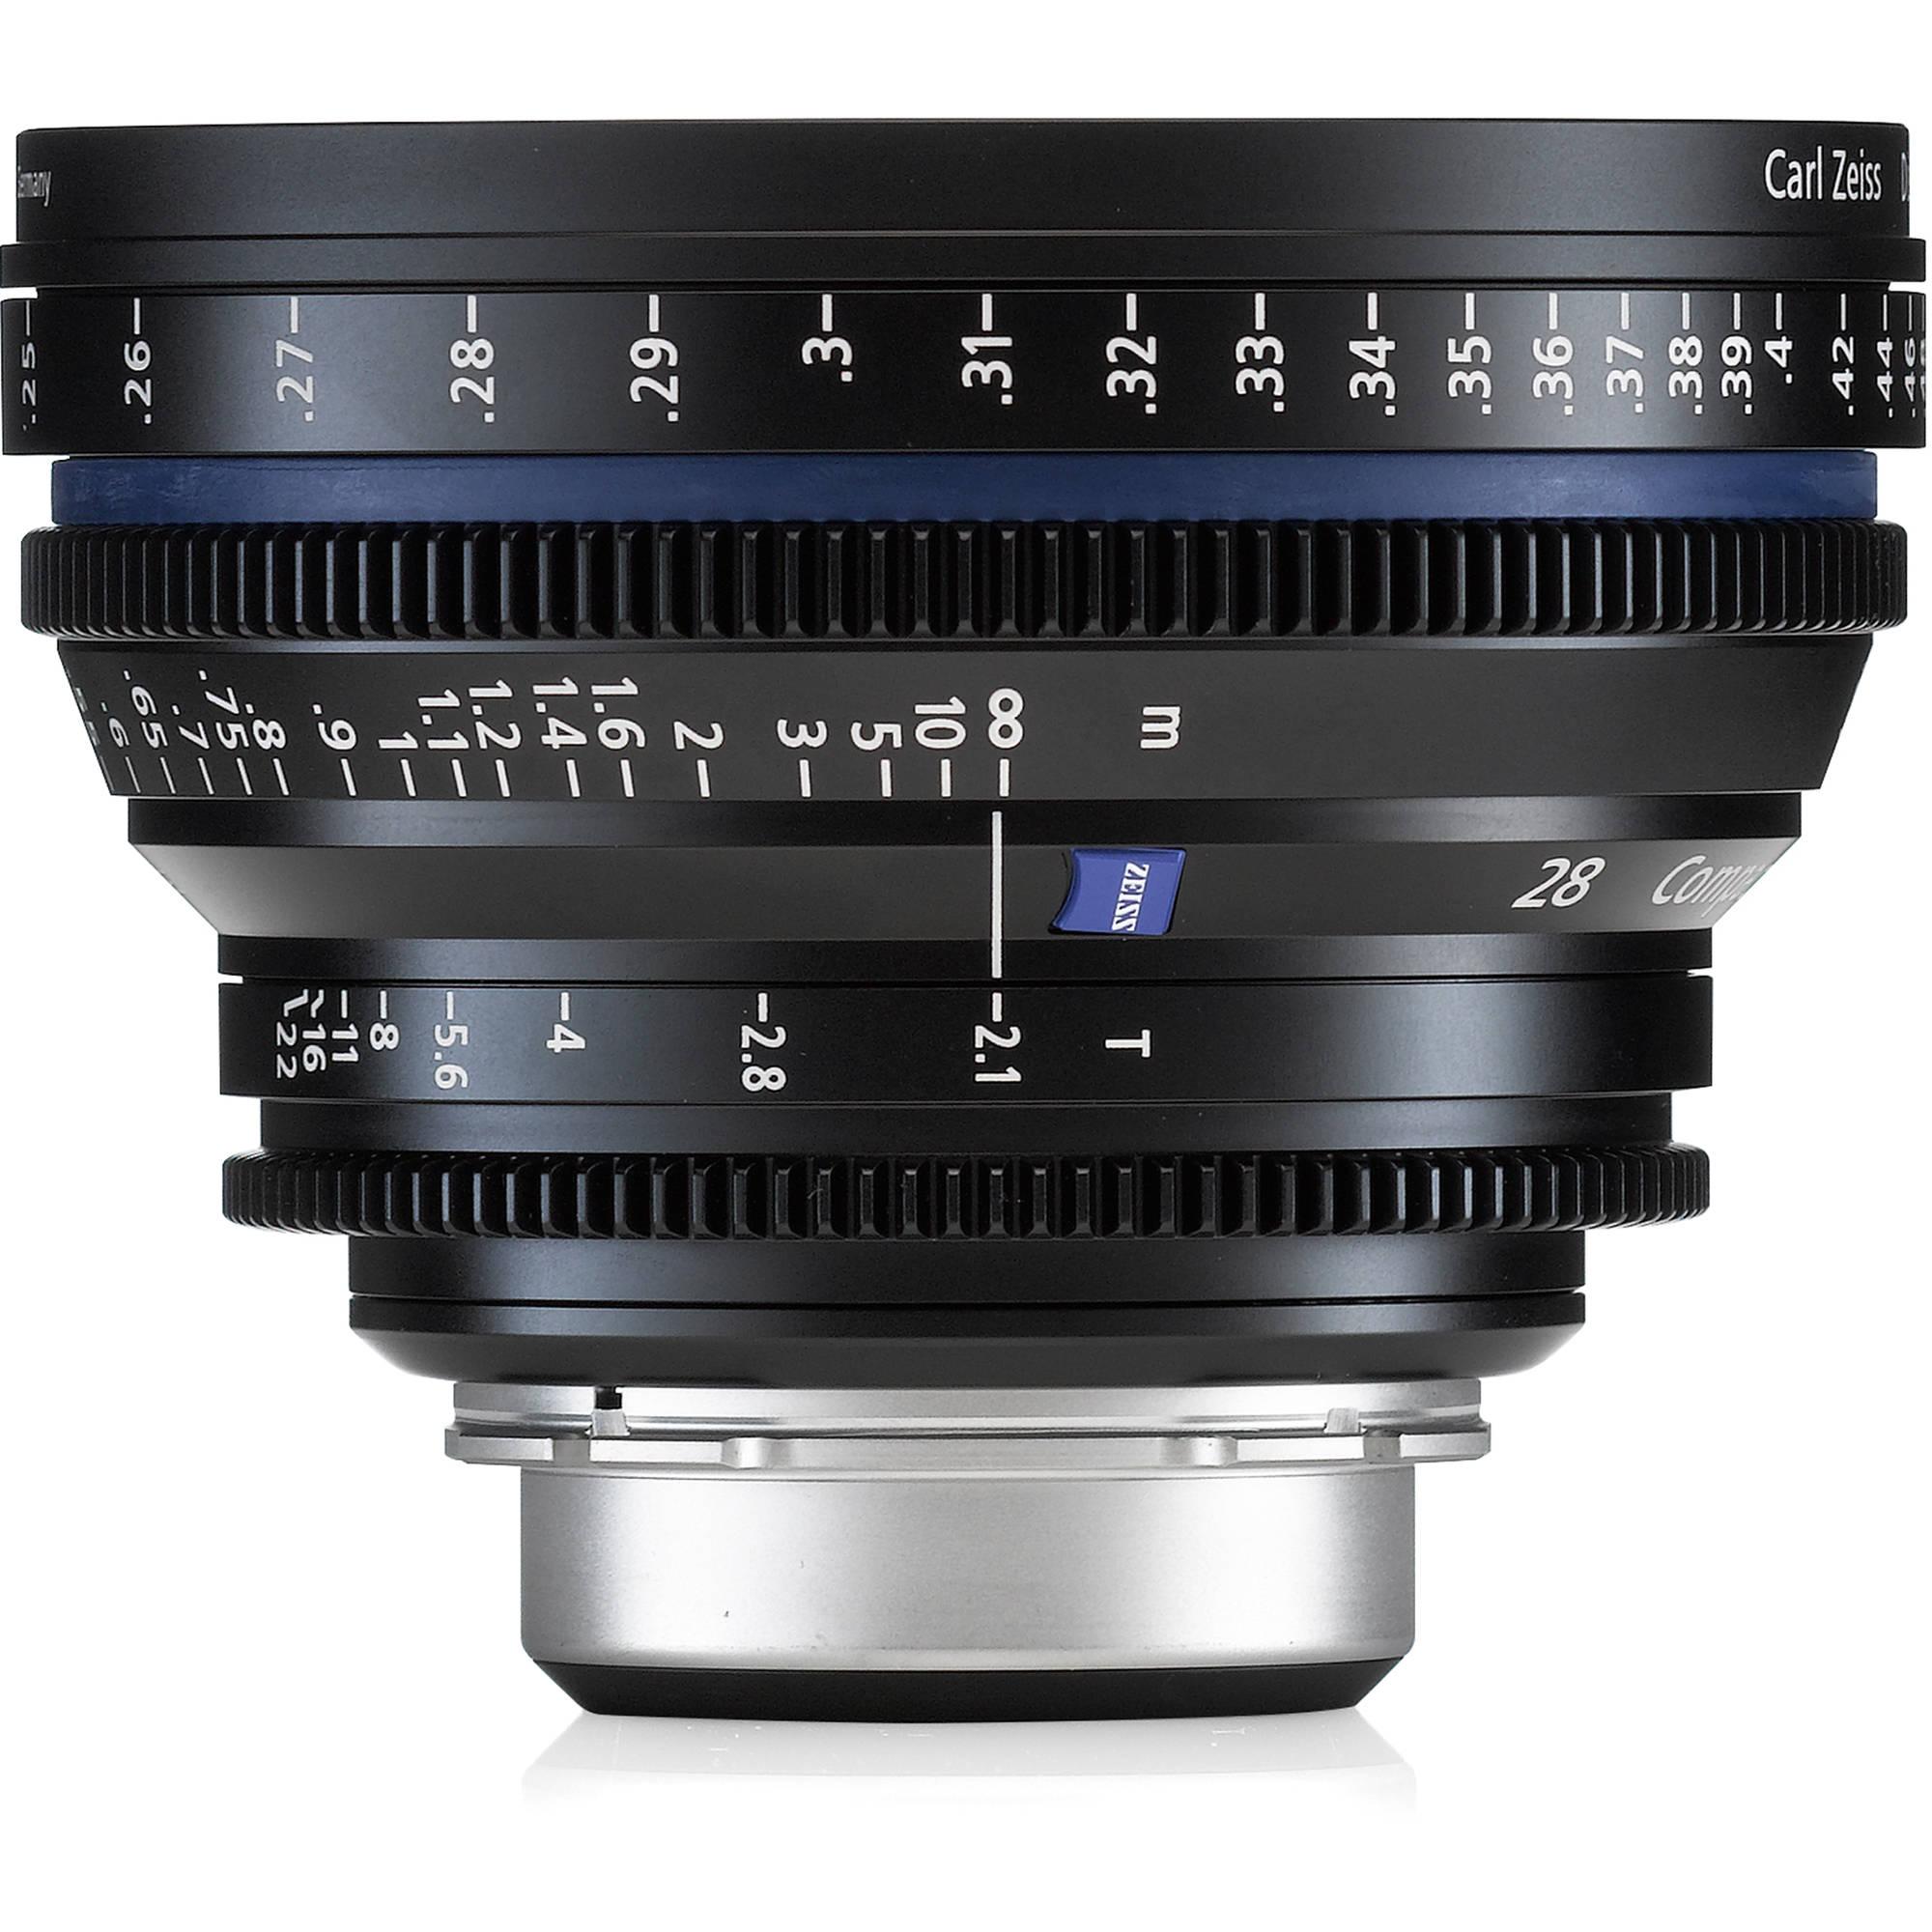 Zeiss CP.2 28mm T/2.1 EF-Mount